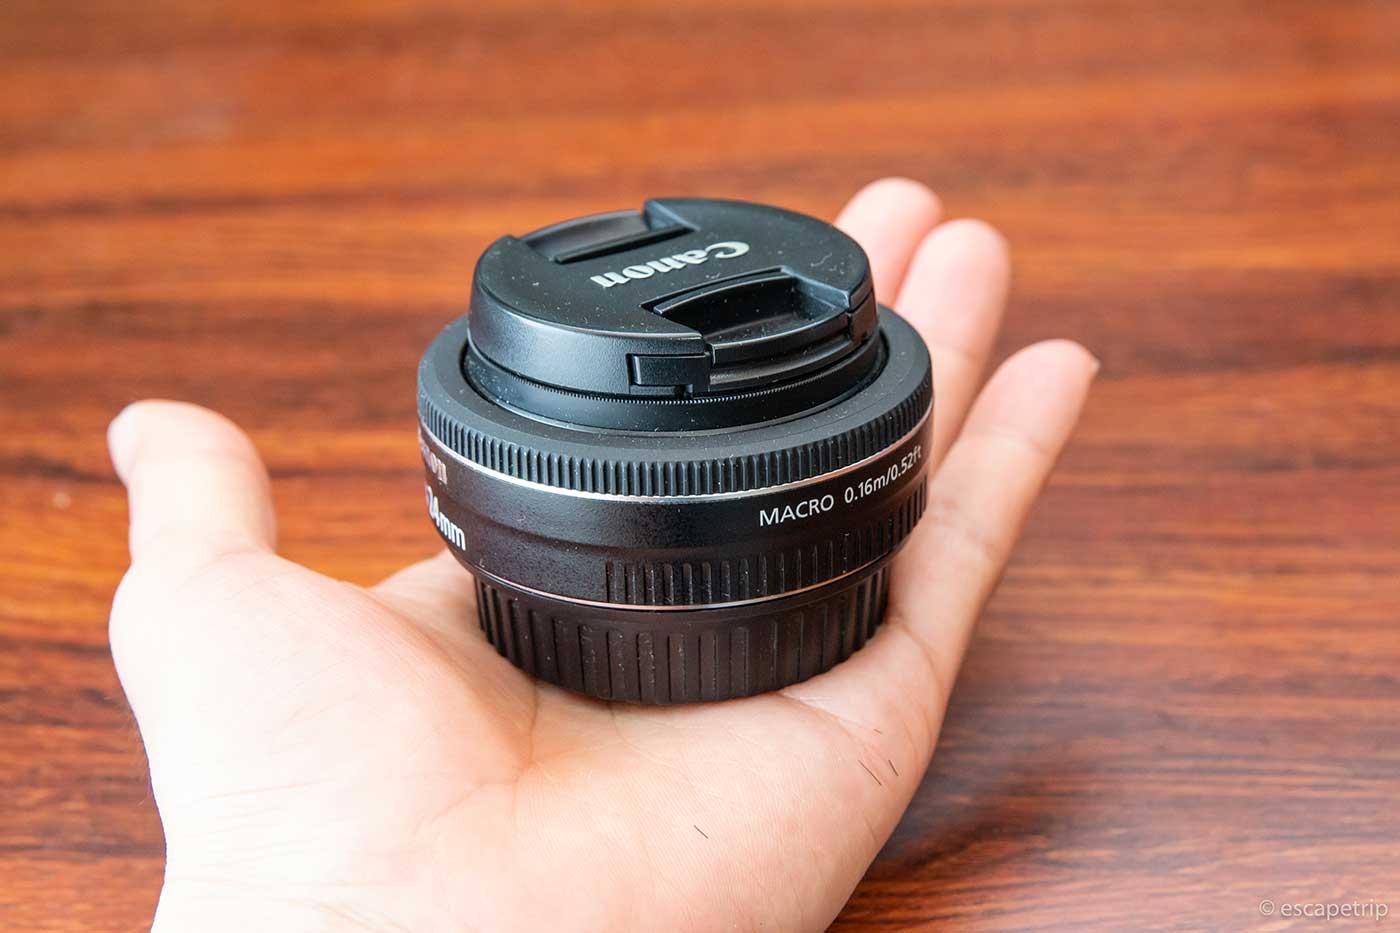 EF-S24mm F2.8 STMのサイズ感